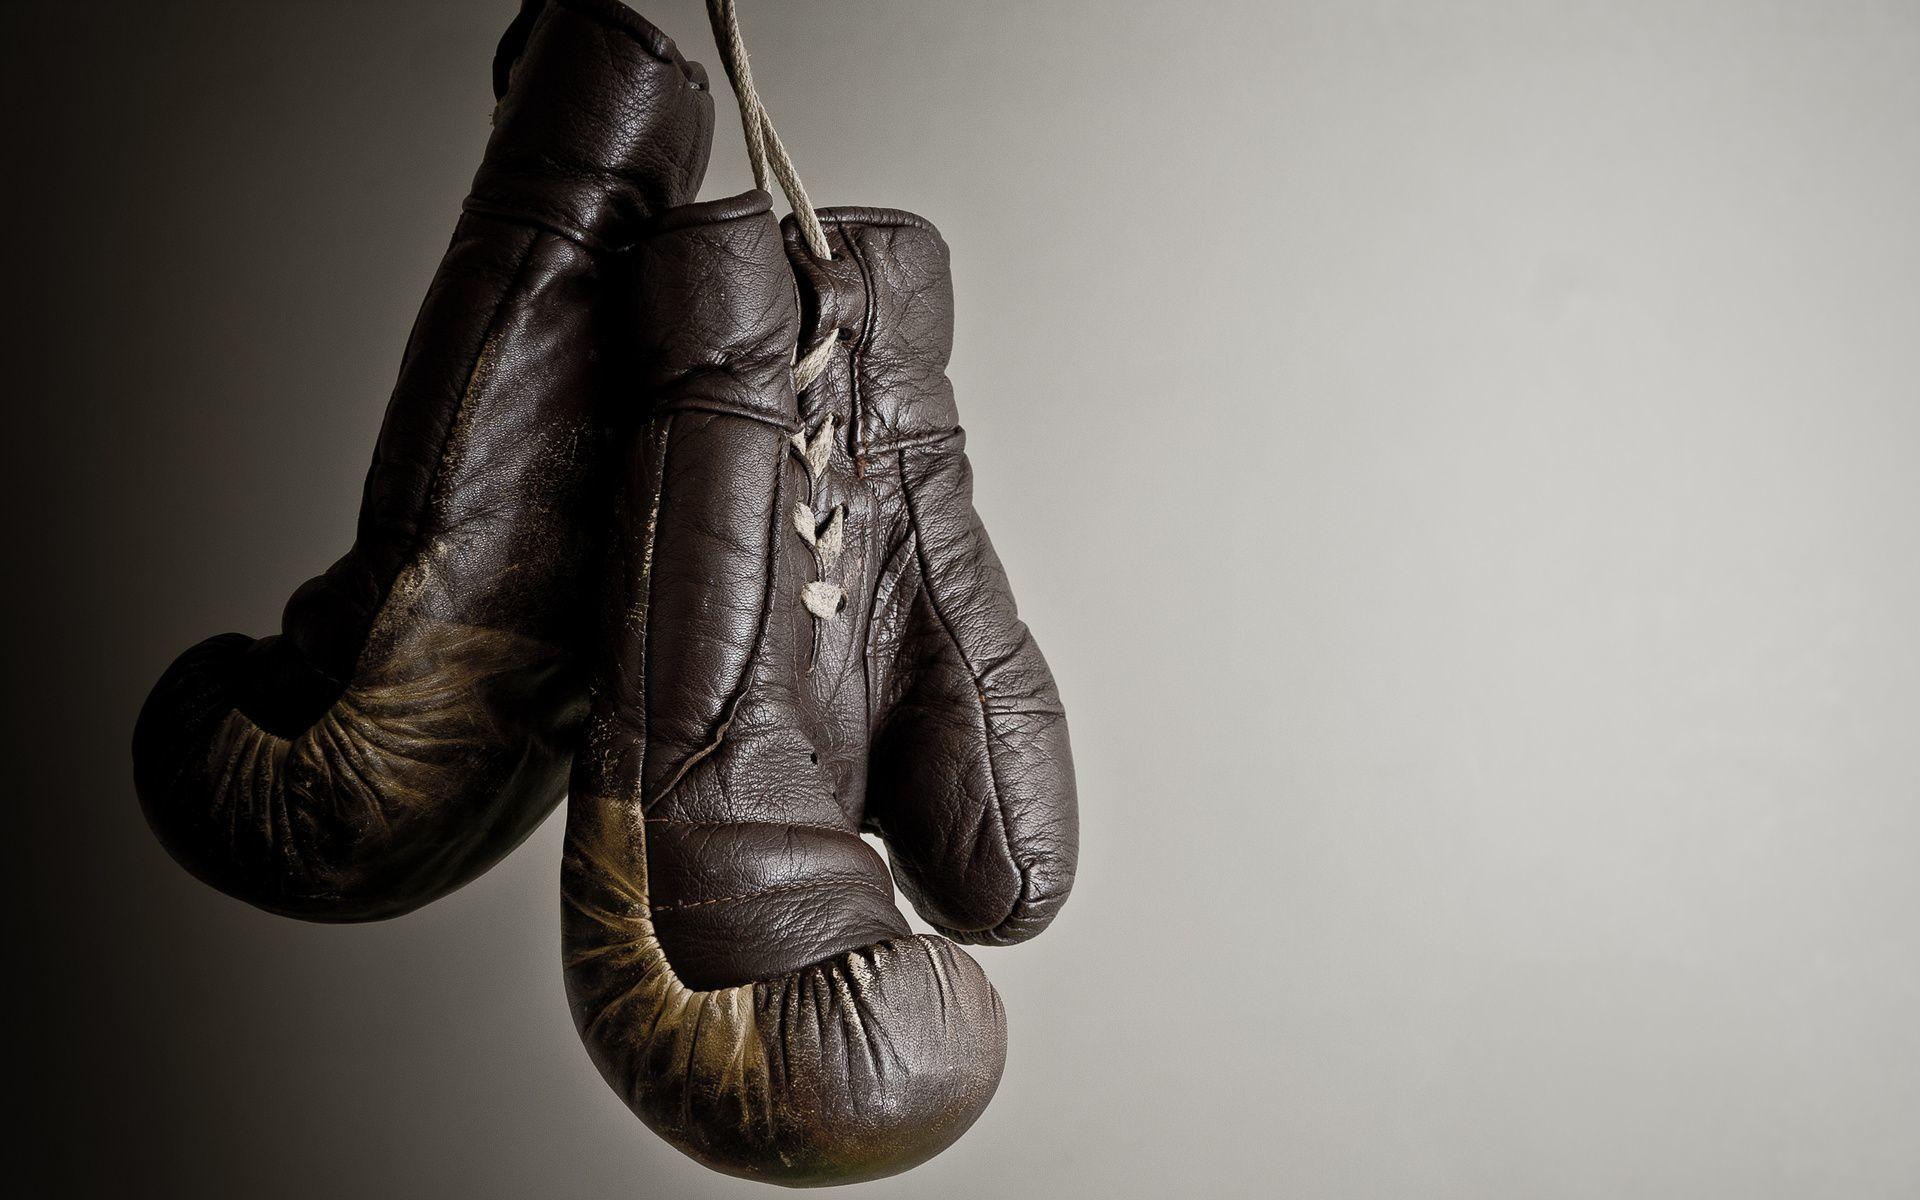 Res: 1920x1200, Boxing Ring Wallpaper wallpaper. | HD Wallpapers | Pinterest | Wallpaper  and Hd wallpaper